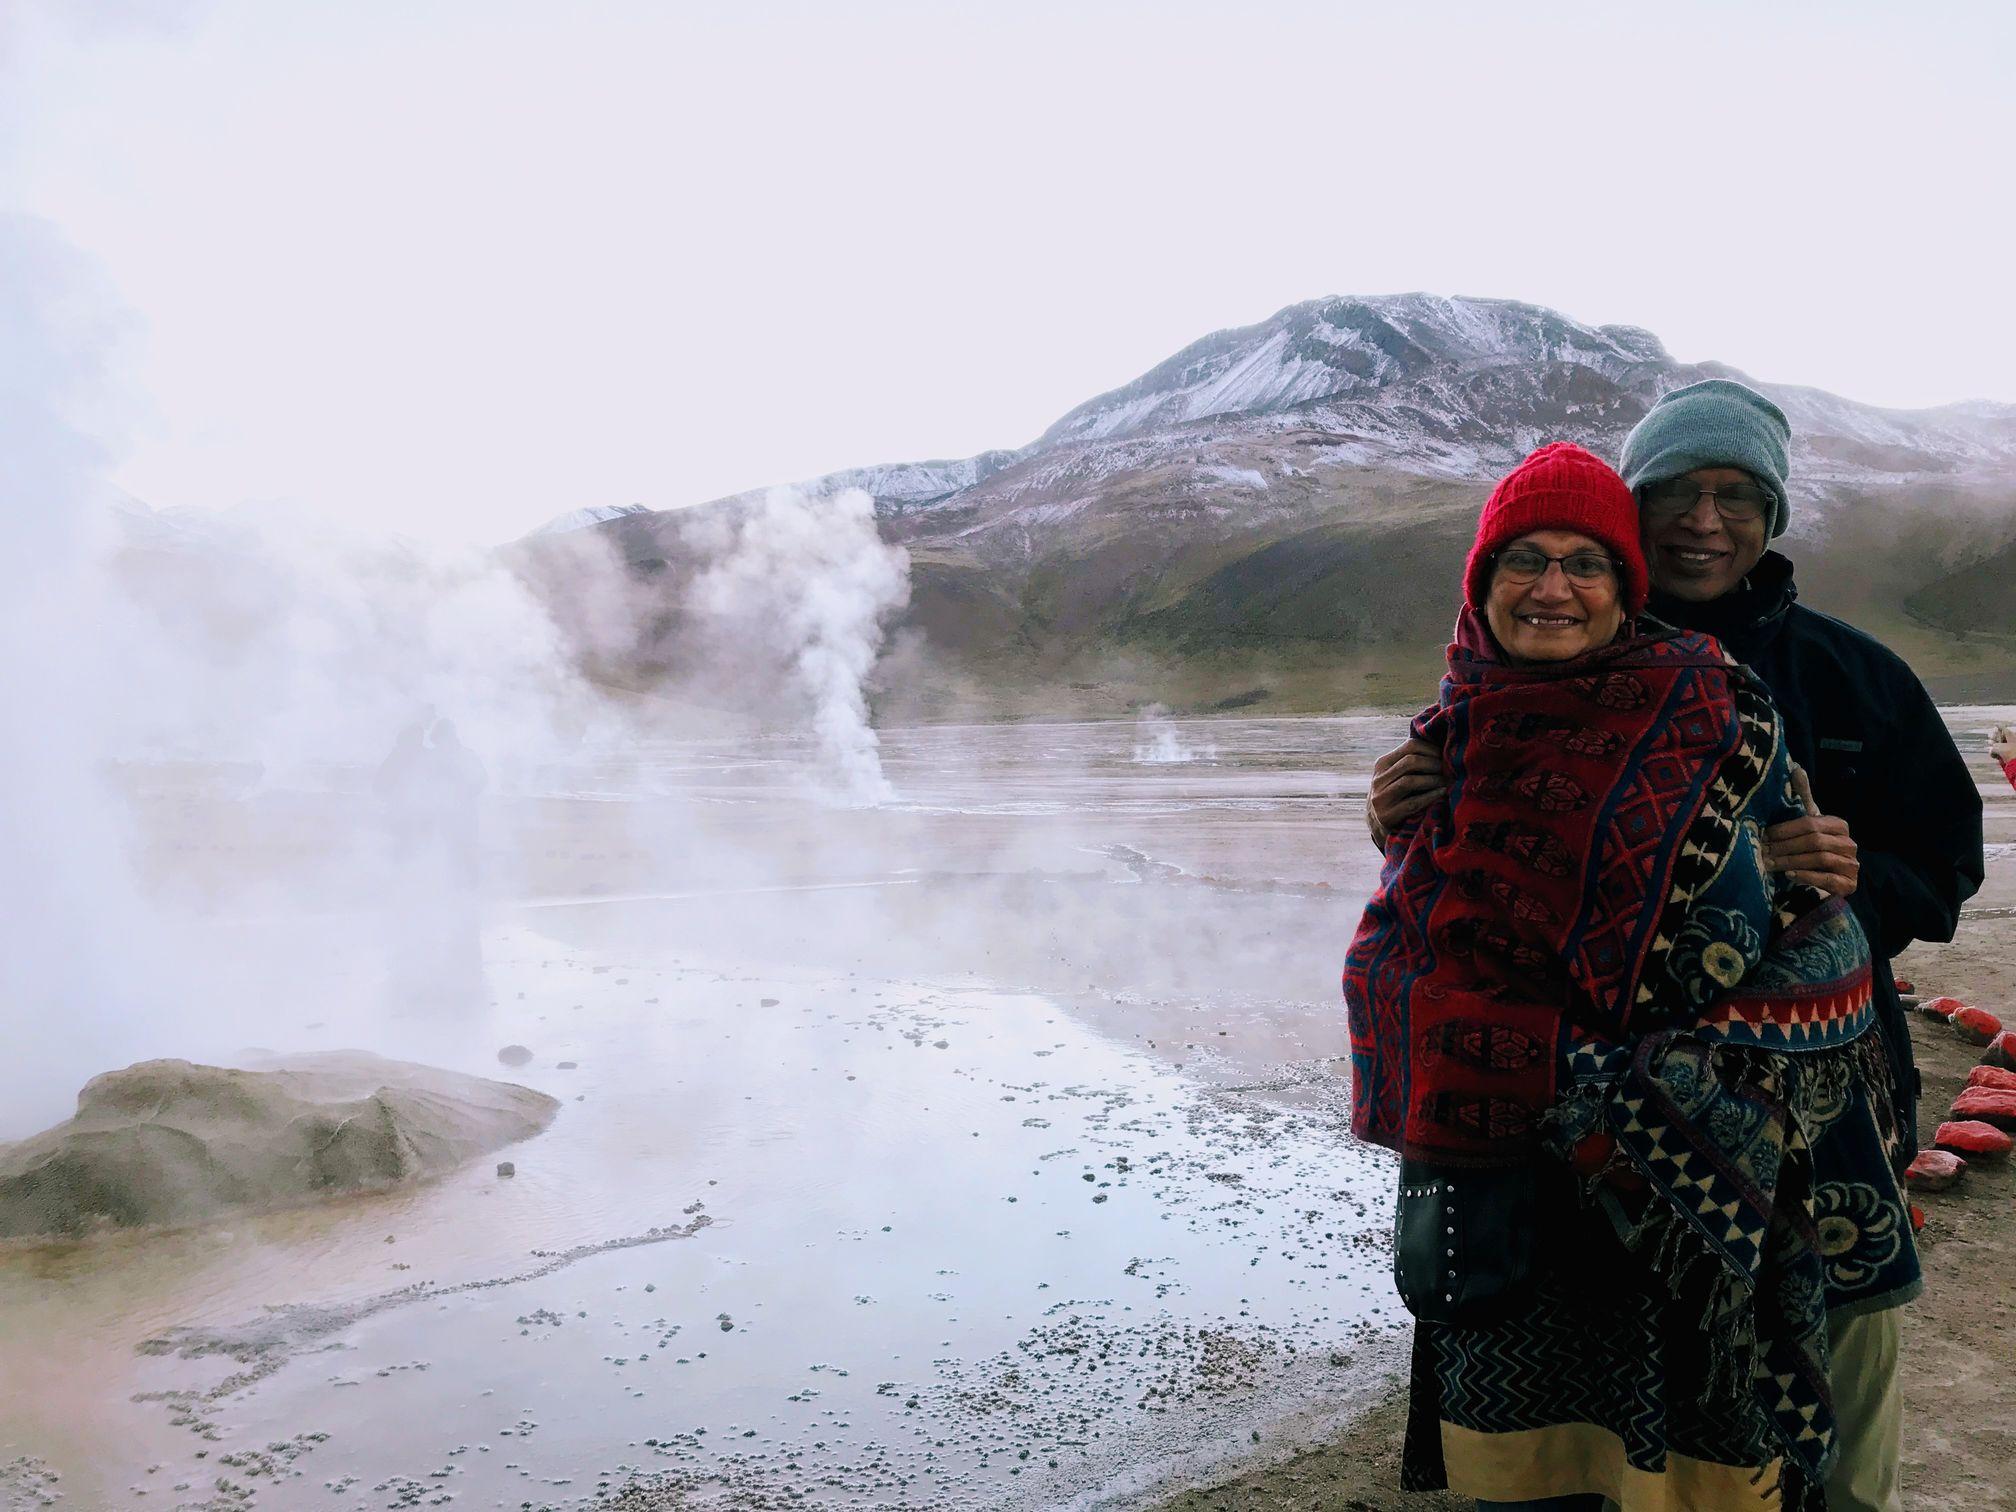 My parents at the Tatio Geysers in Atacama Desert, Chile